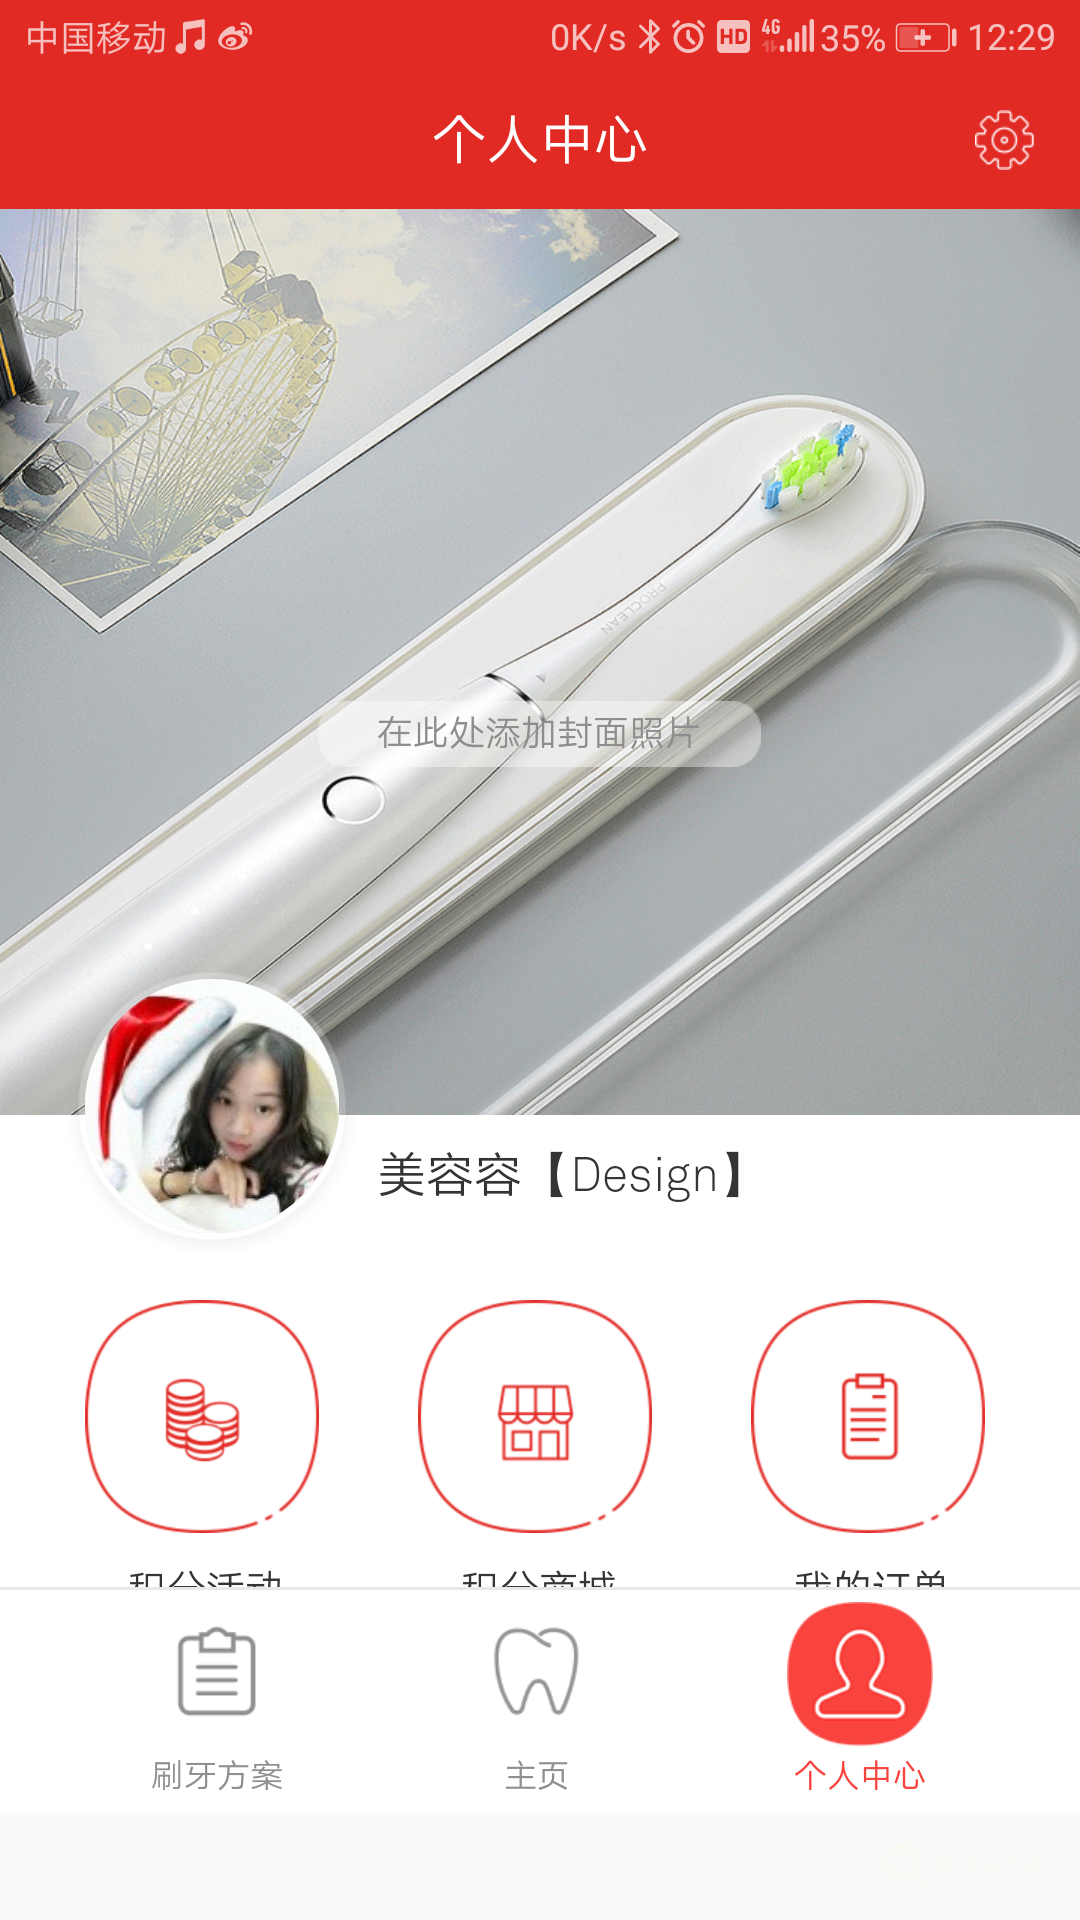 Screenshot_20180125-122909.png